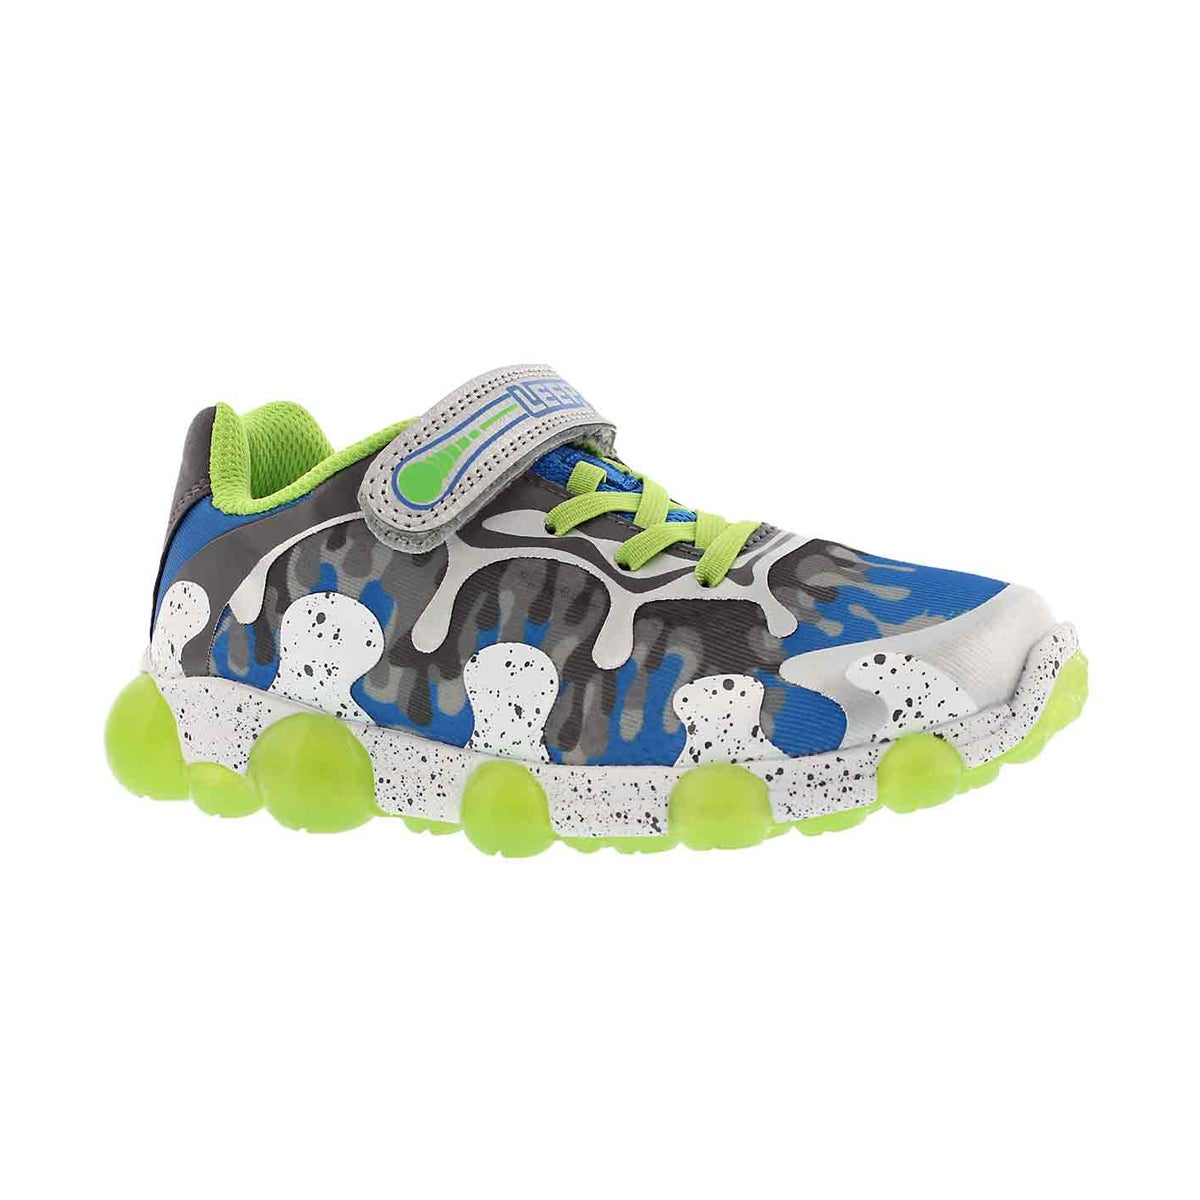 Boys' LEEPZ 2.0 grey/green light up sneakers